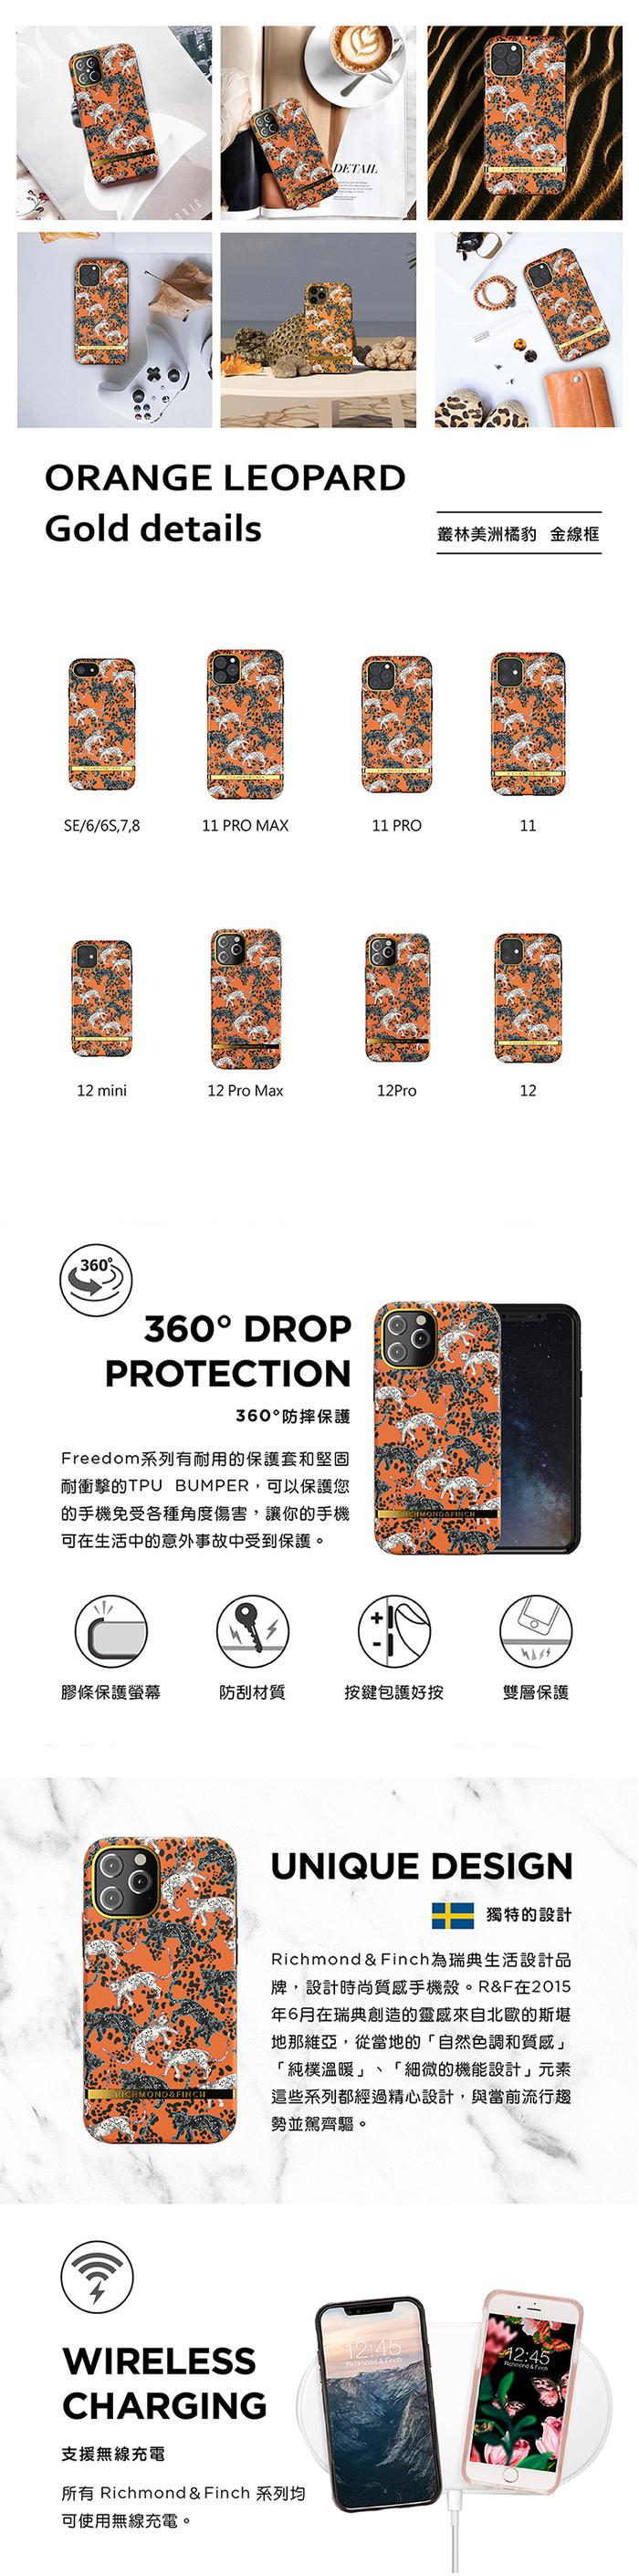 Richmond & Finch│iPhone 6/7/8/SE(4.7吋)叢林美洲橘豹 金線框手機殼